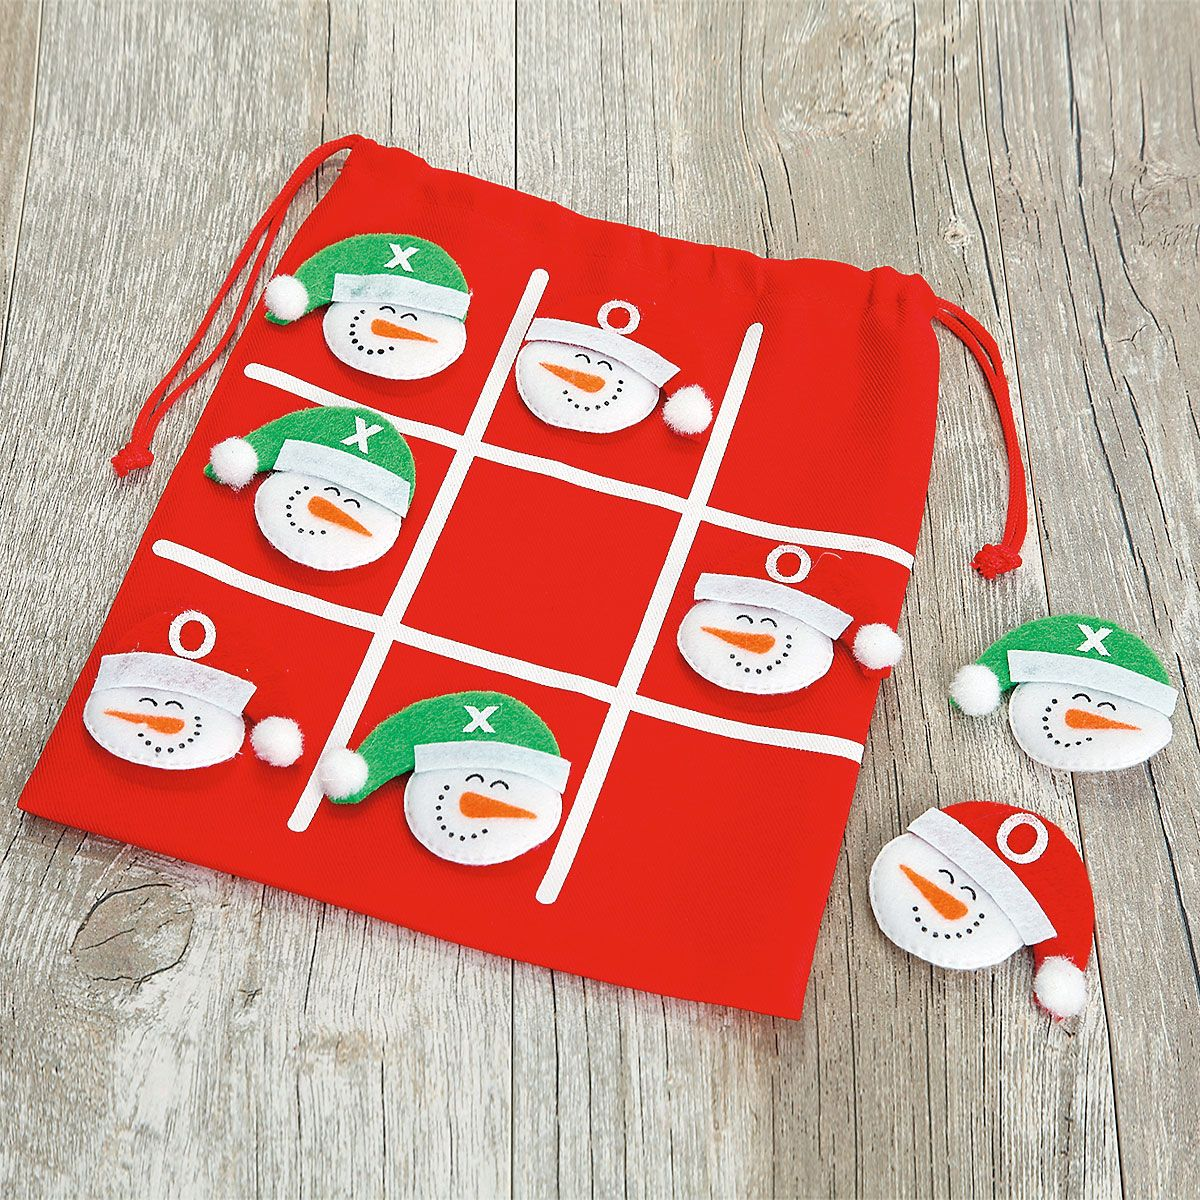 Fabric Tic Tac Toe Game In a Bag - Buy 1, Get 1 Free